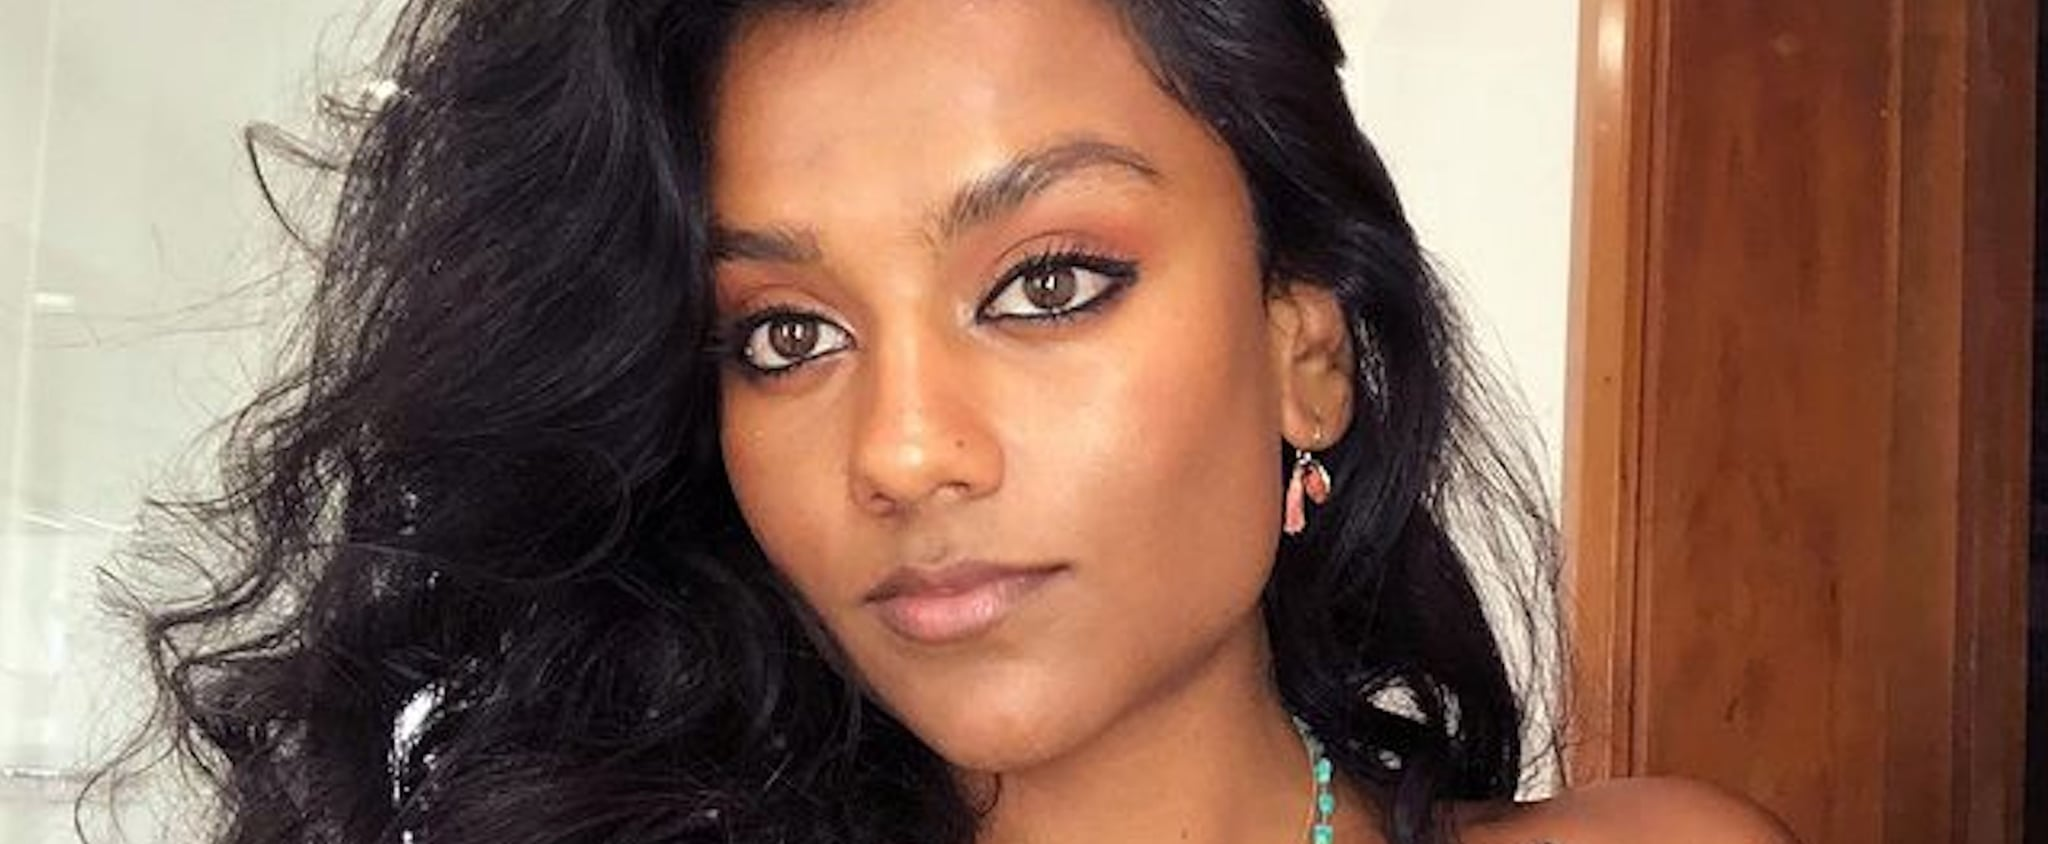 Get to Know Simone Ashley, Bridgerton's New Leading Lady